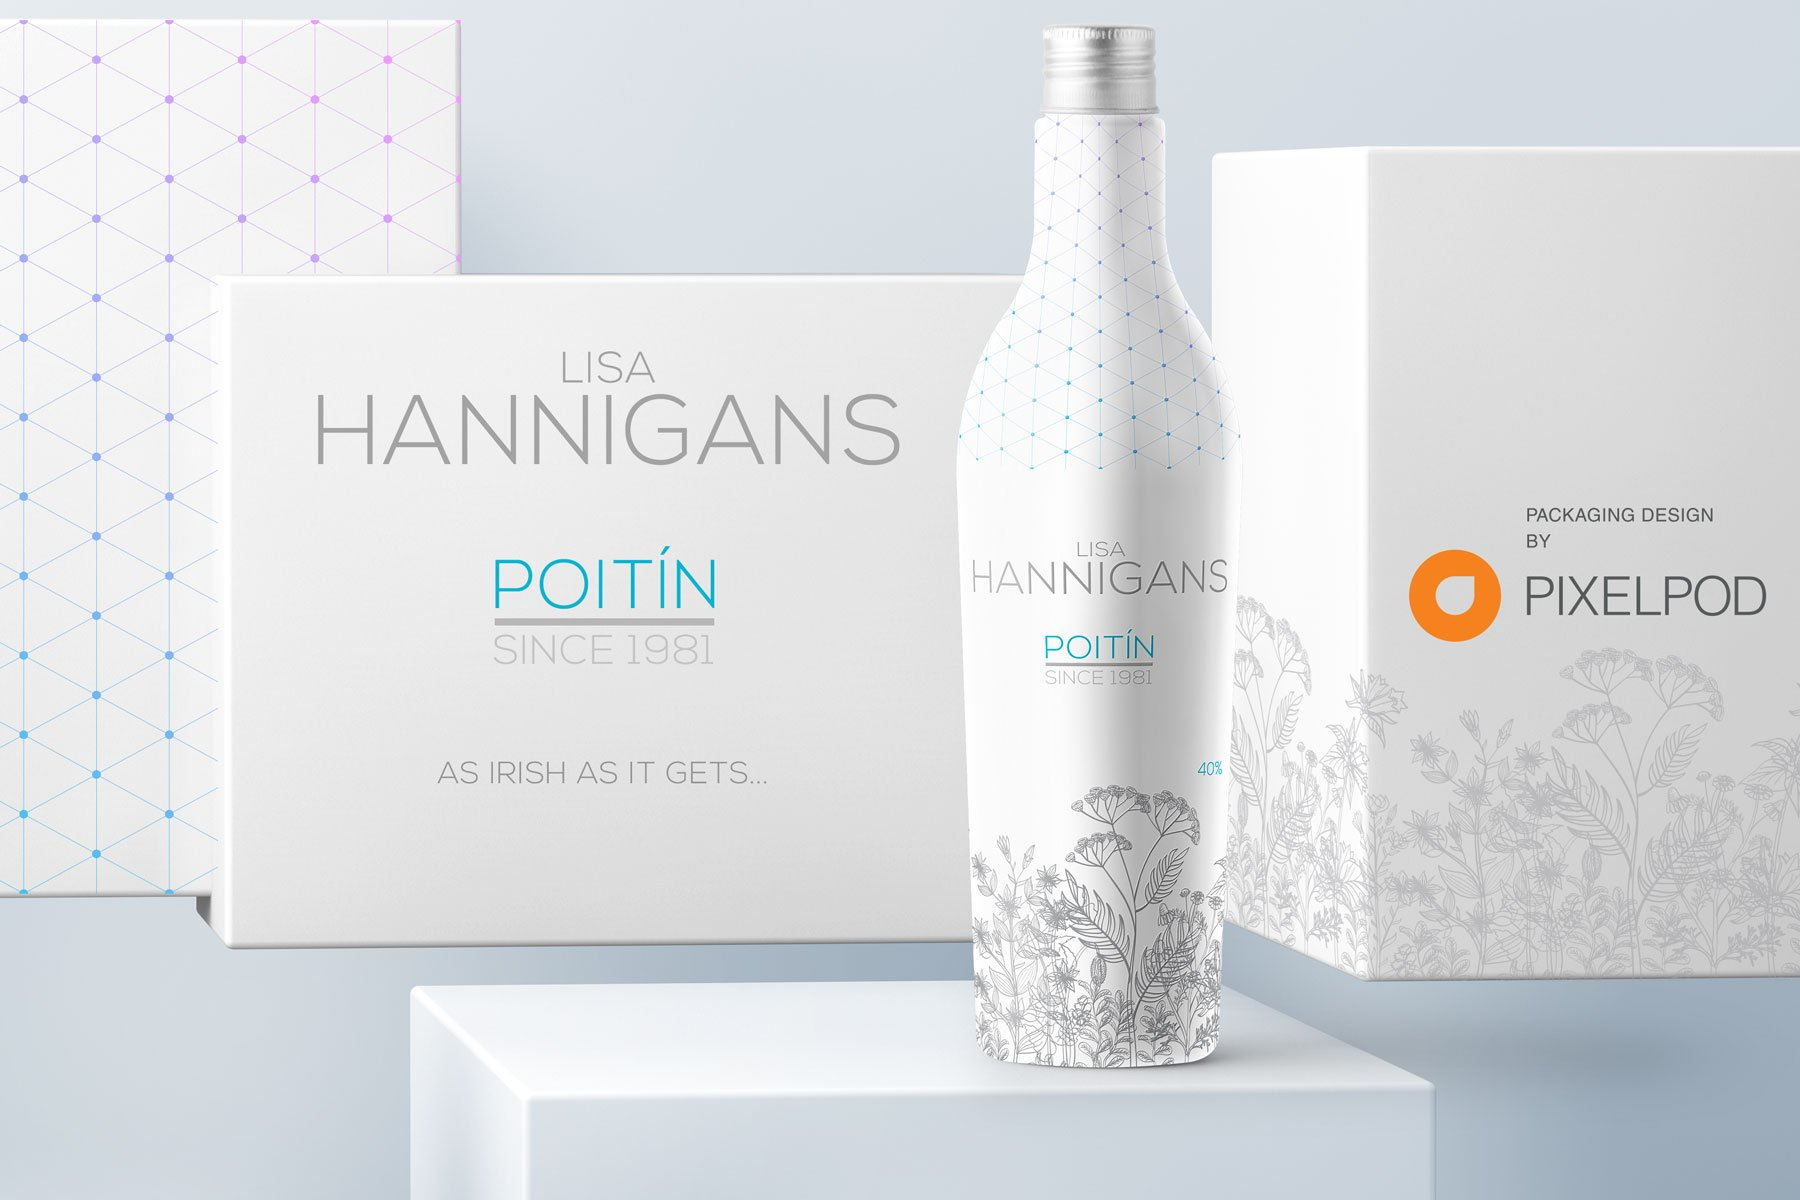 Lisa Hannigan poitin, packaging design by pixelpod